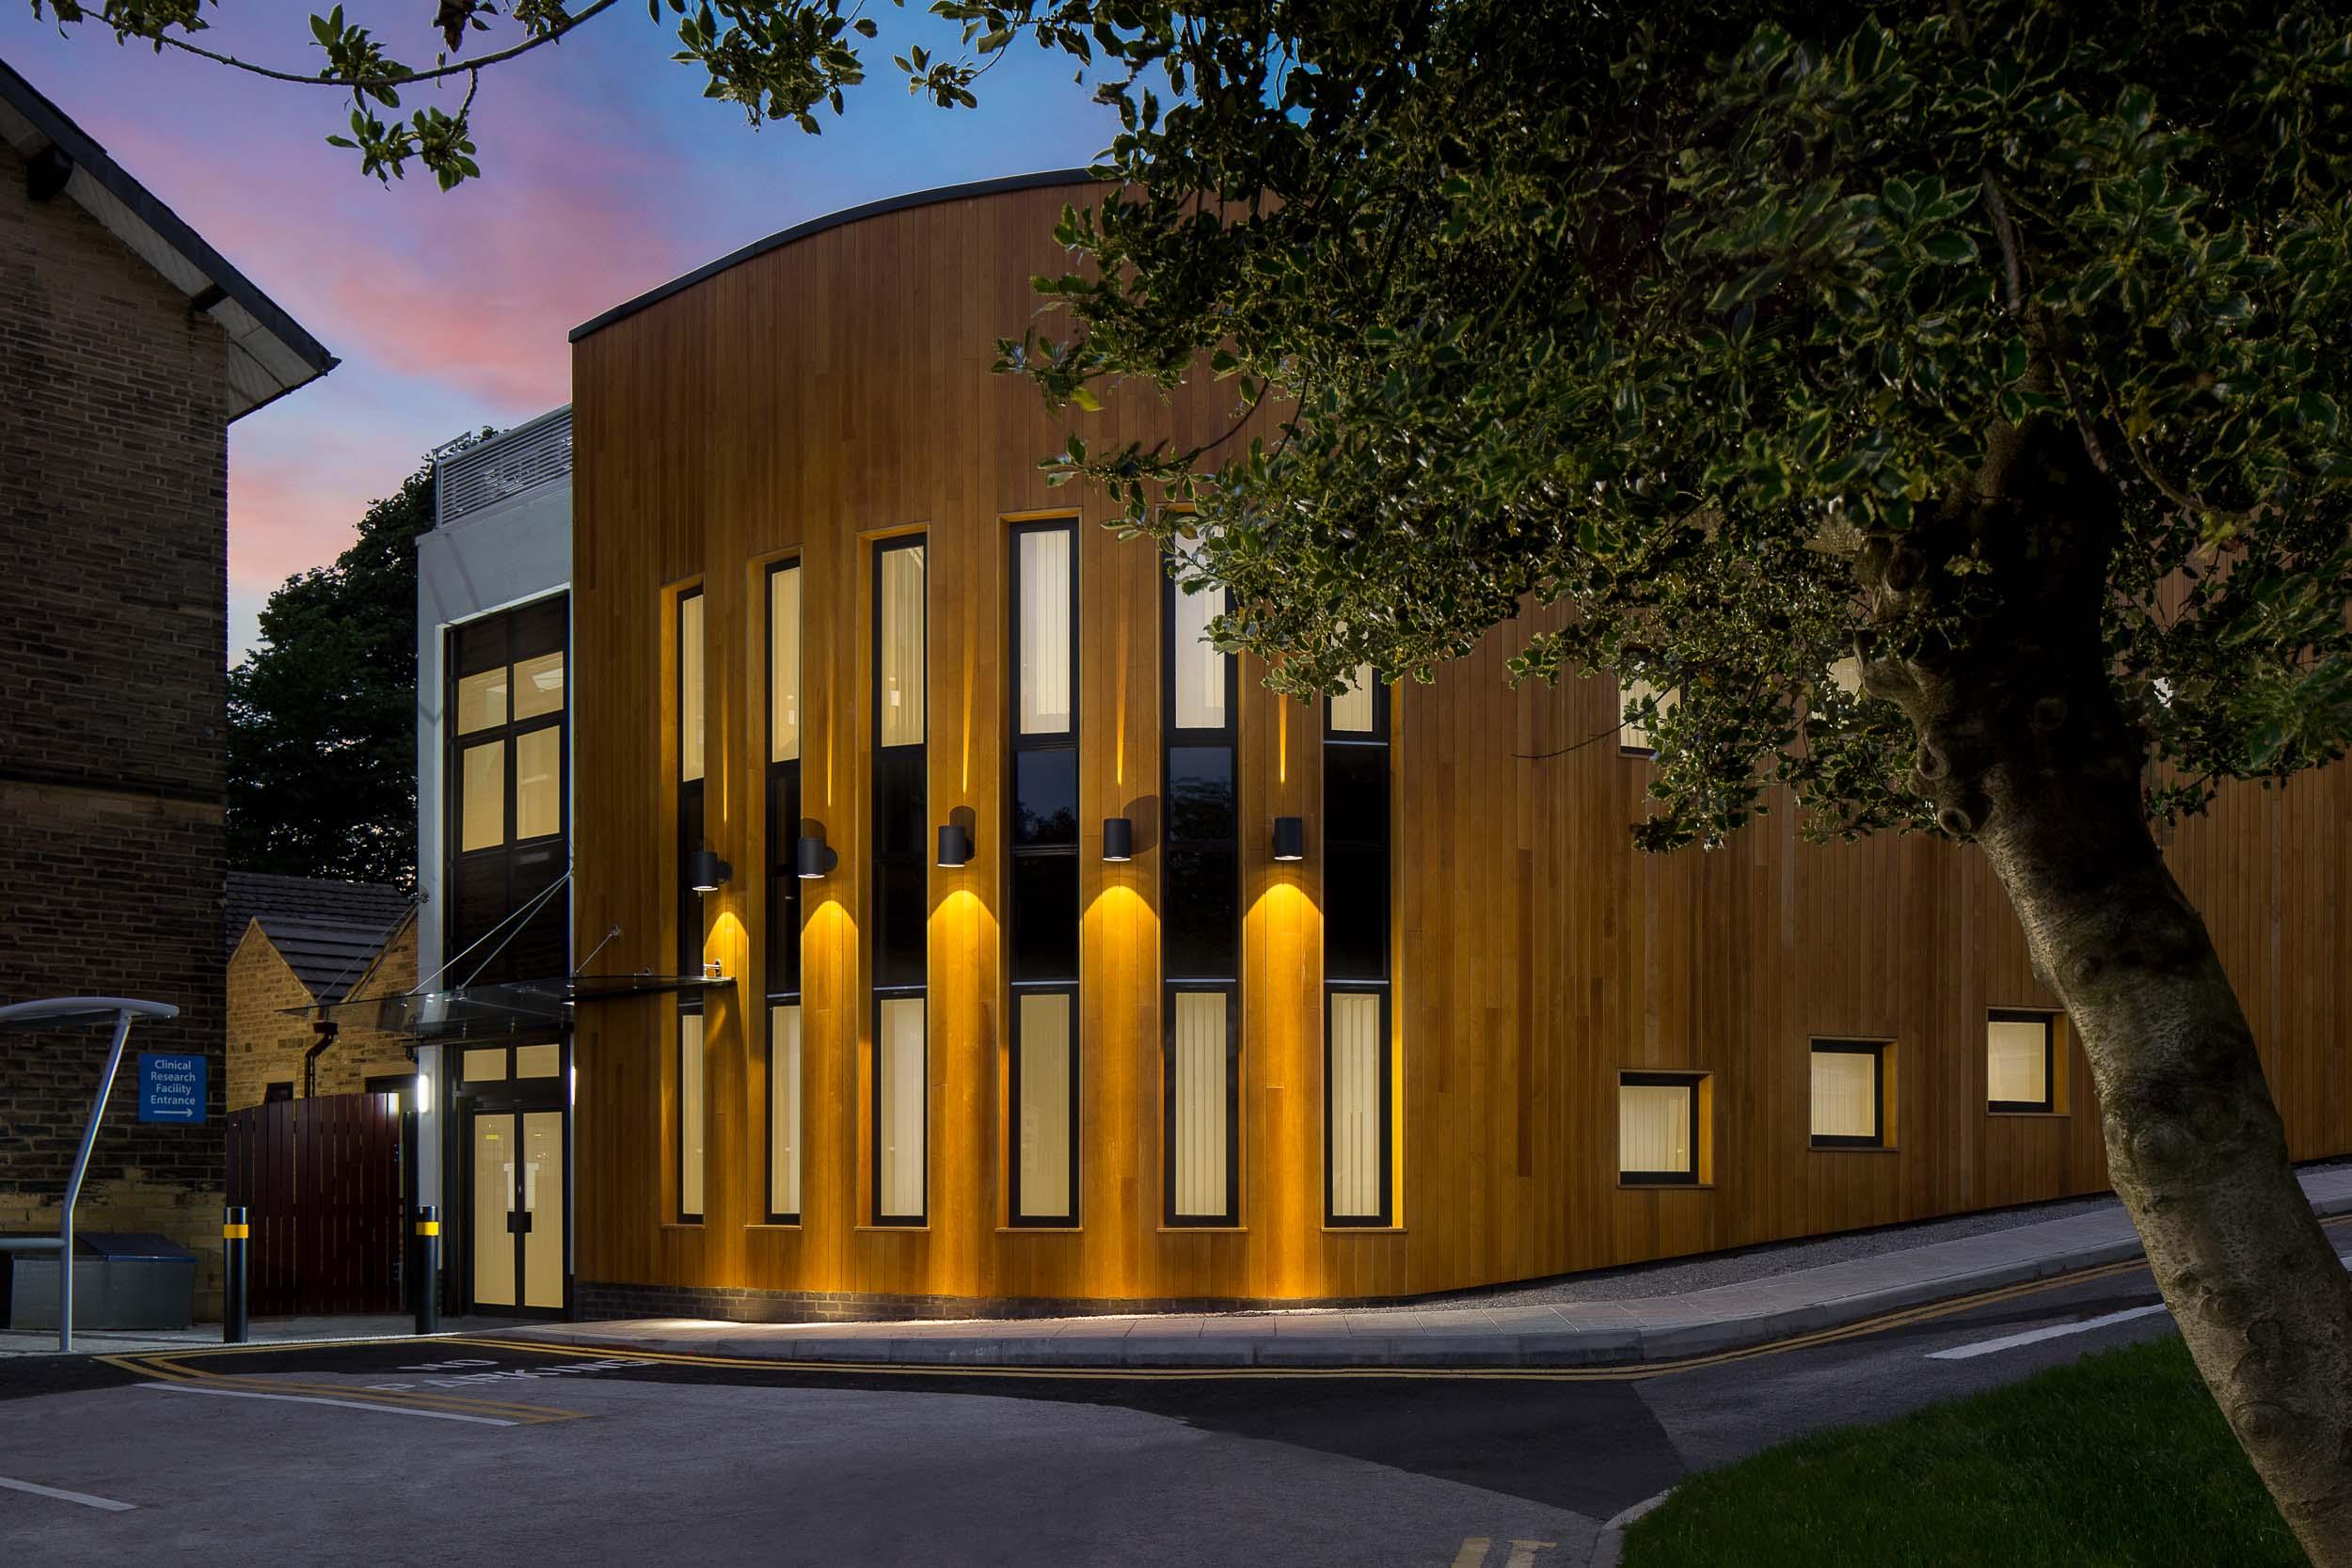 bradford royal infirmary temple bank house new building exterior twilight.jpg